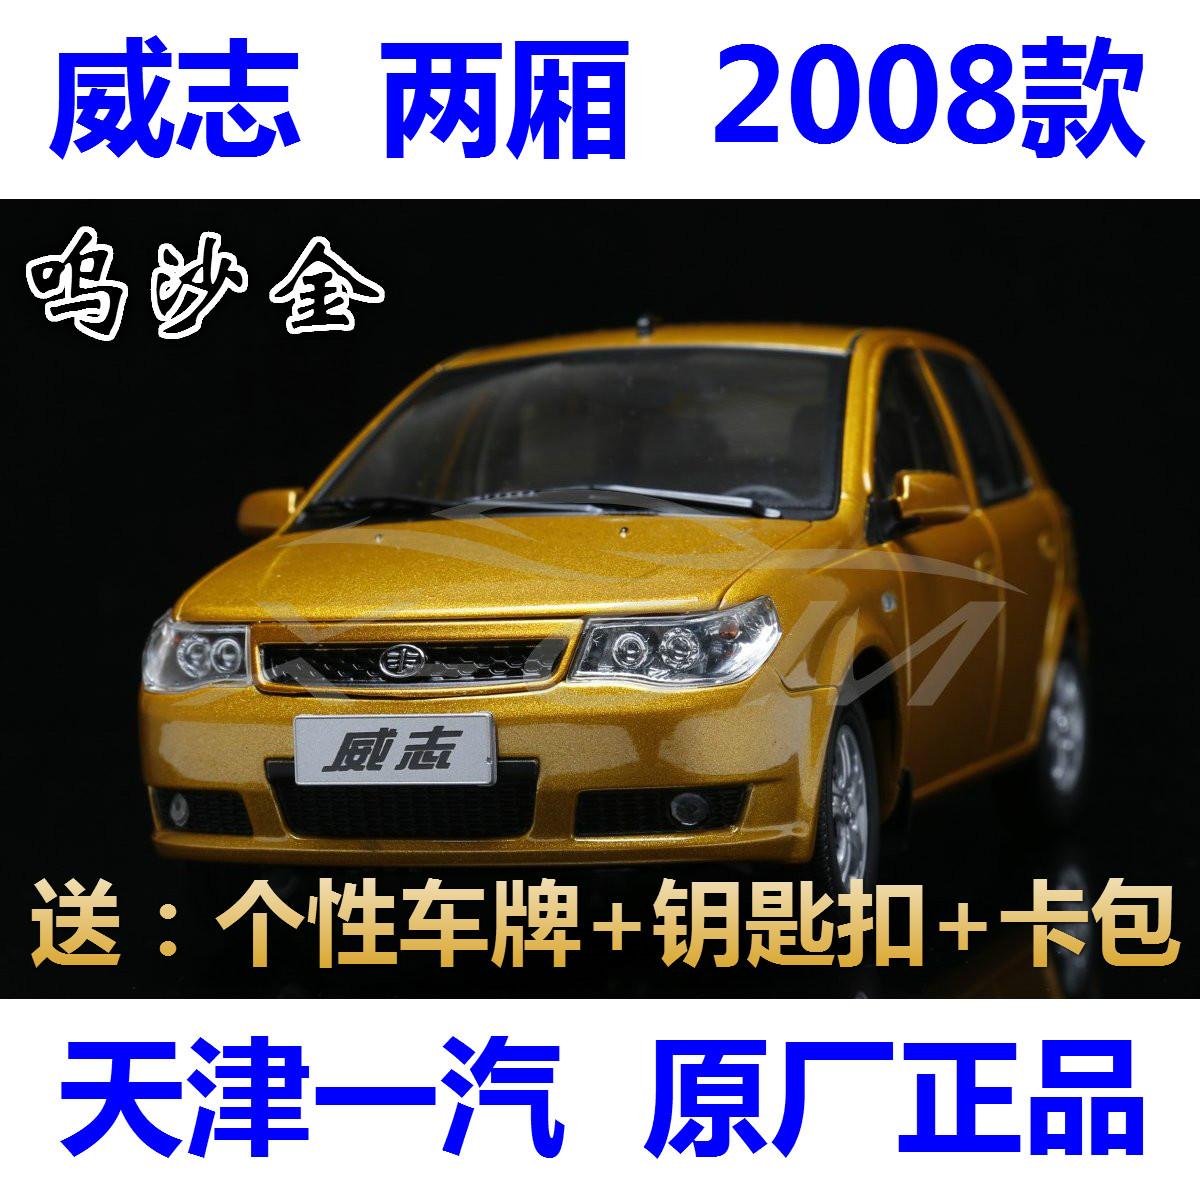 1:18 factory of Tianjin FAW Weizhi 2008 alloy model cars<br><br>Aliexpress